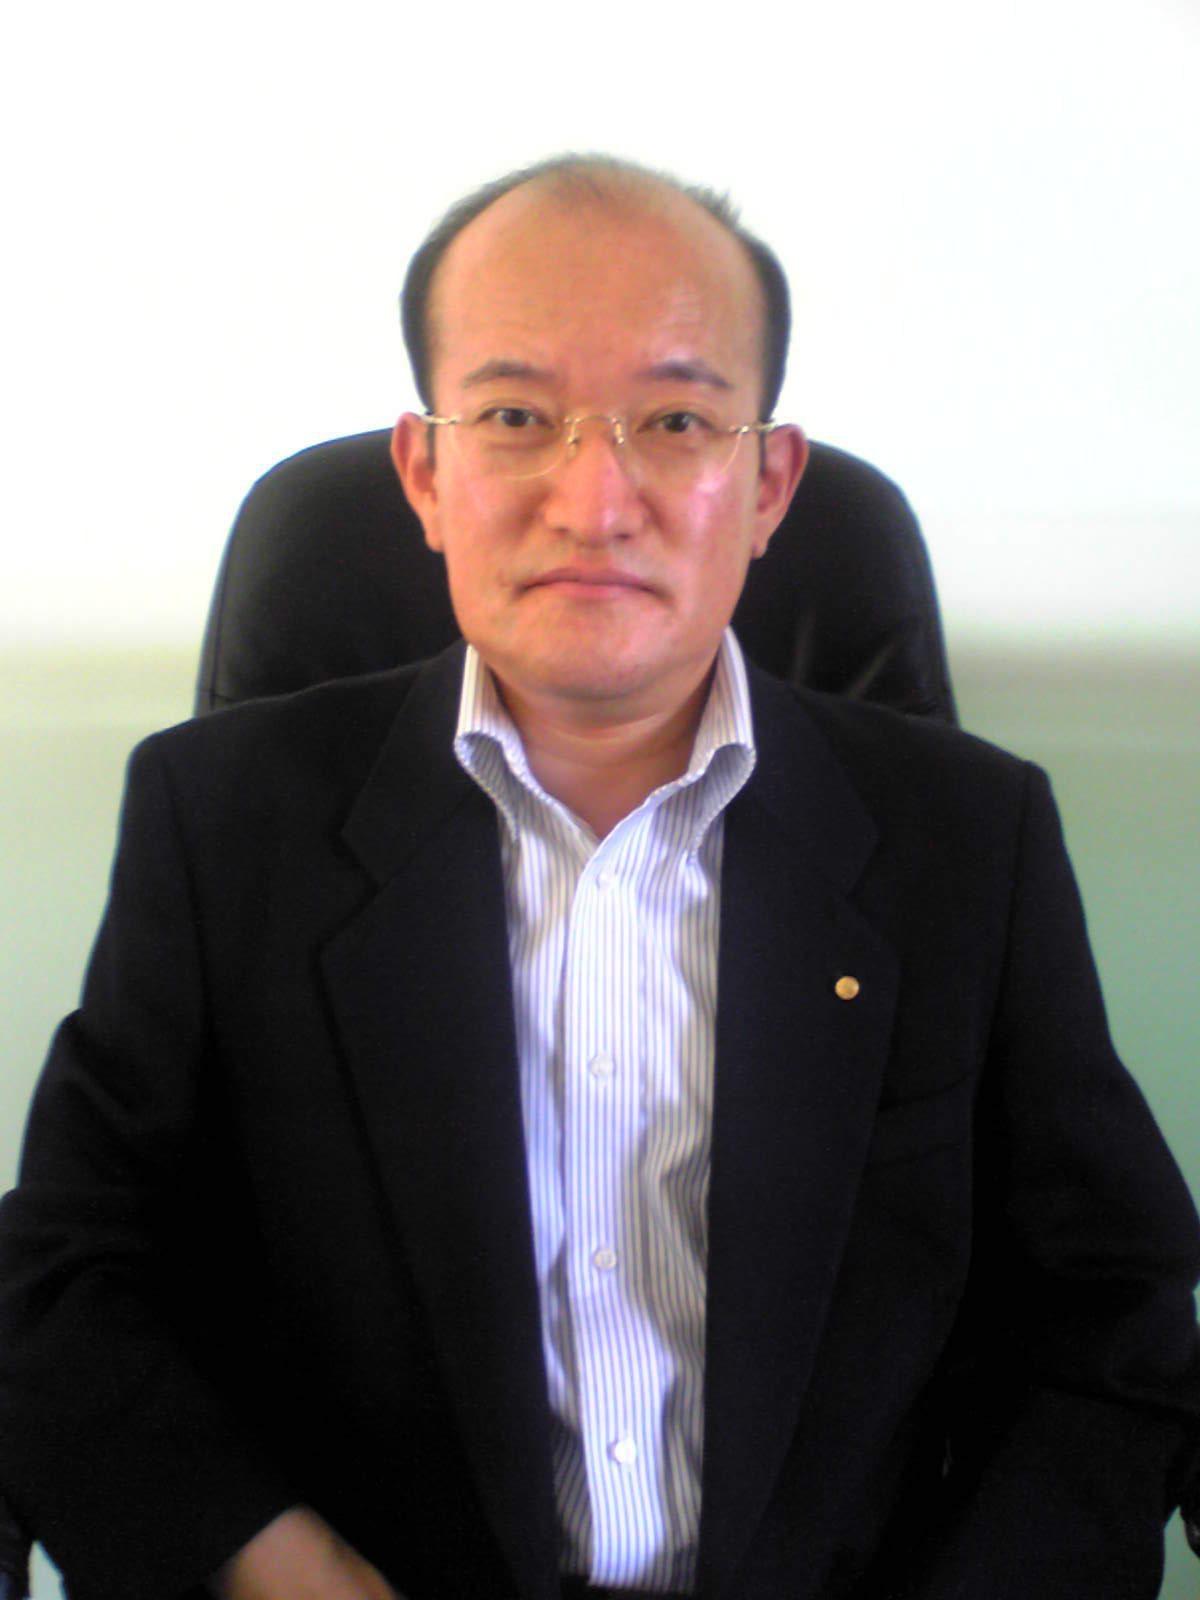 センター長/経営士 馬場寛朗